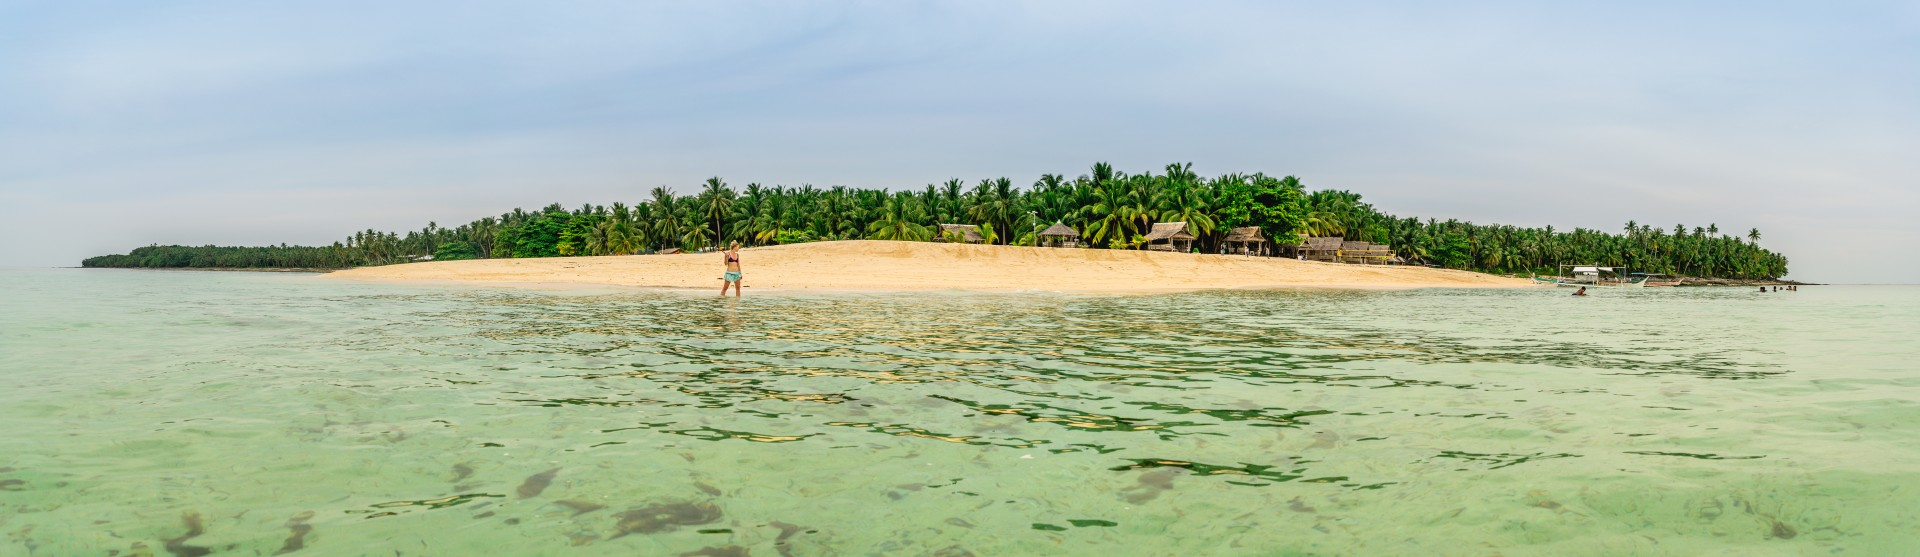 Dako island Siargao